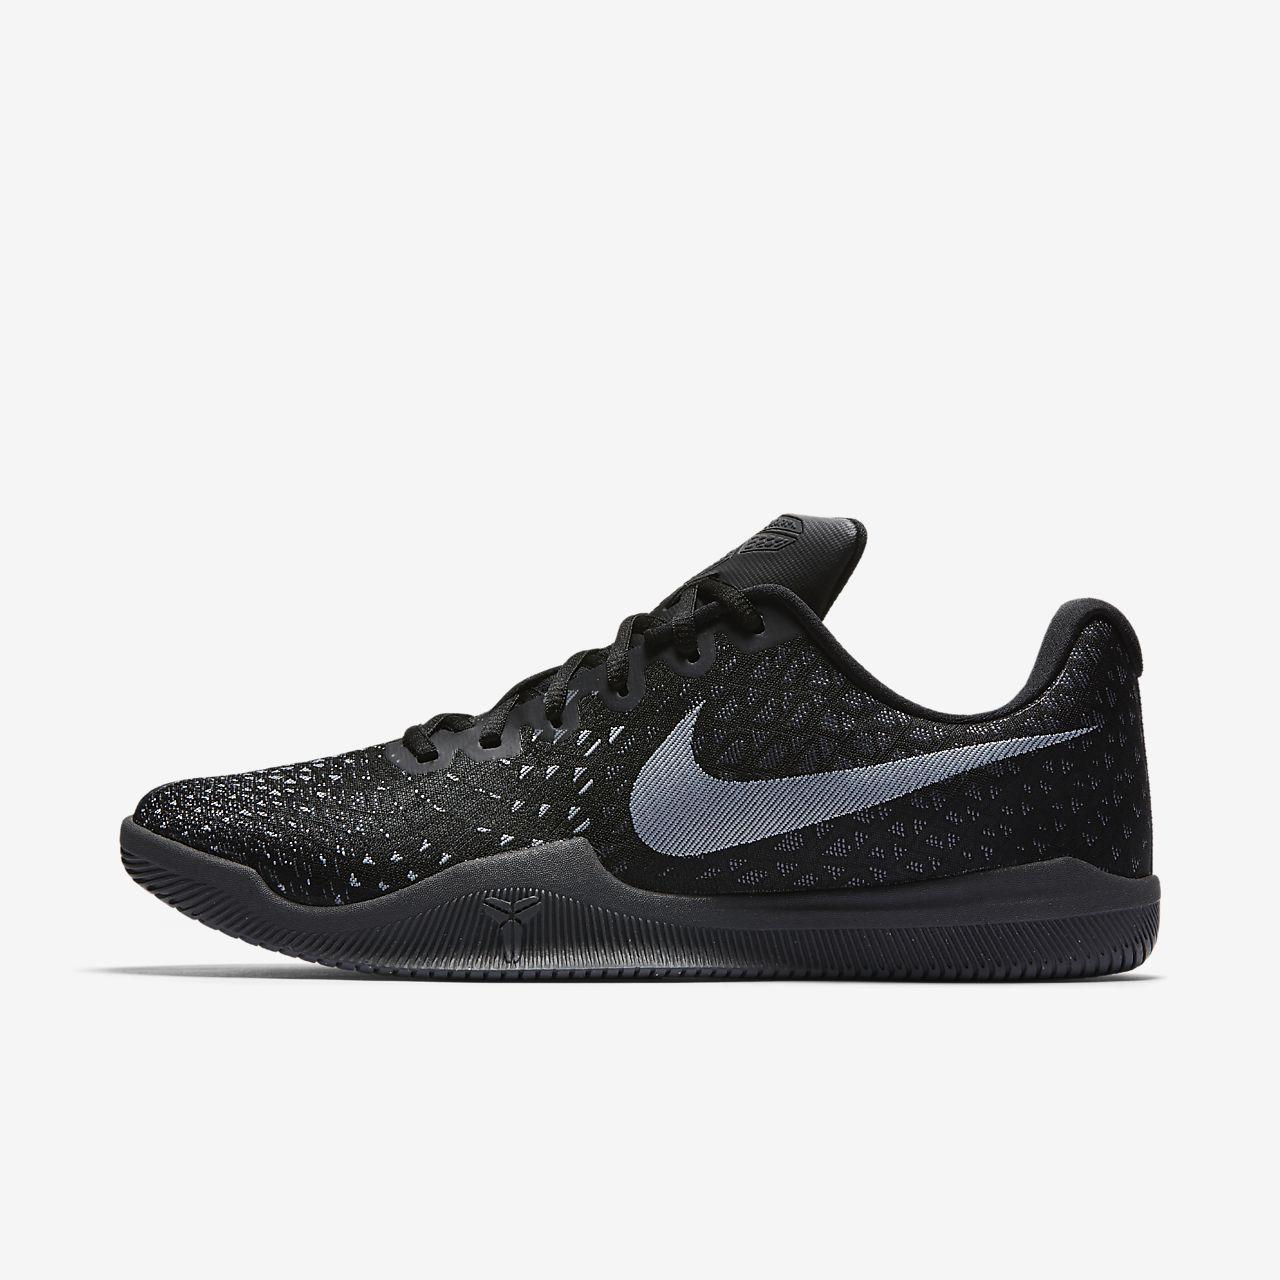 ... Nike Kobe Mamba Instinct Men's Basketball Shoe